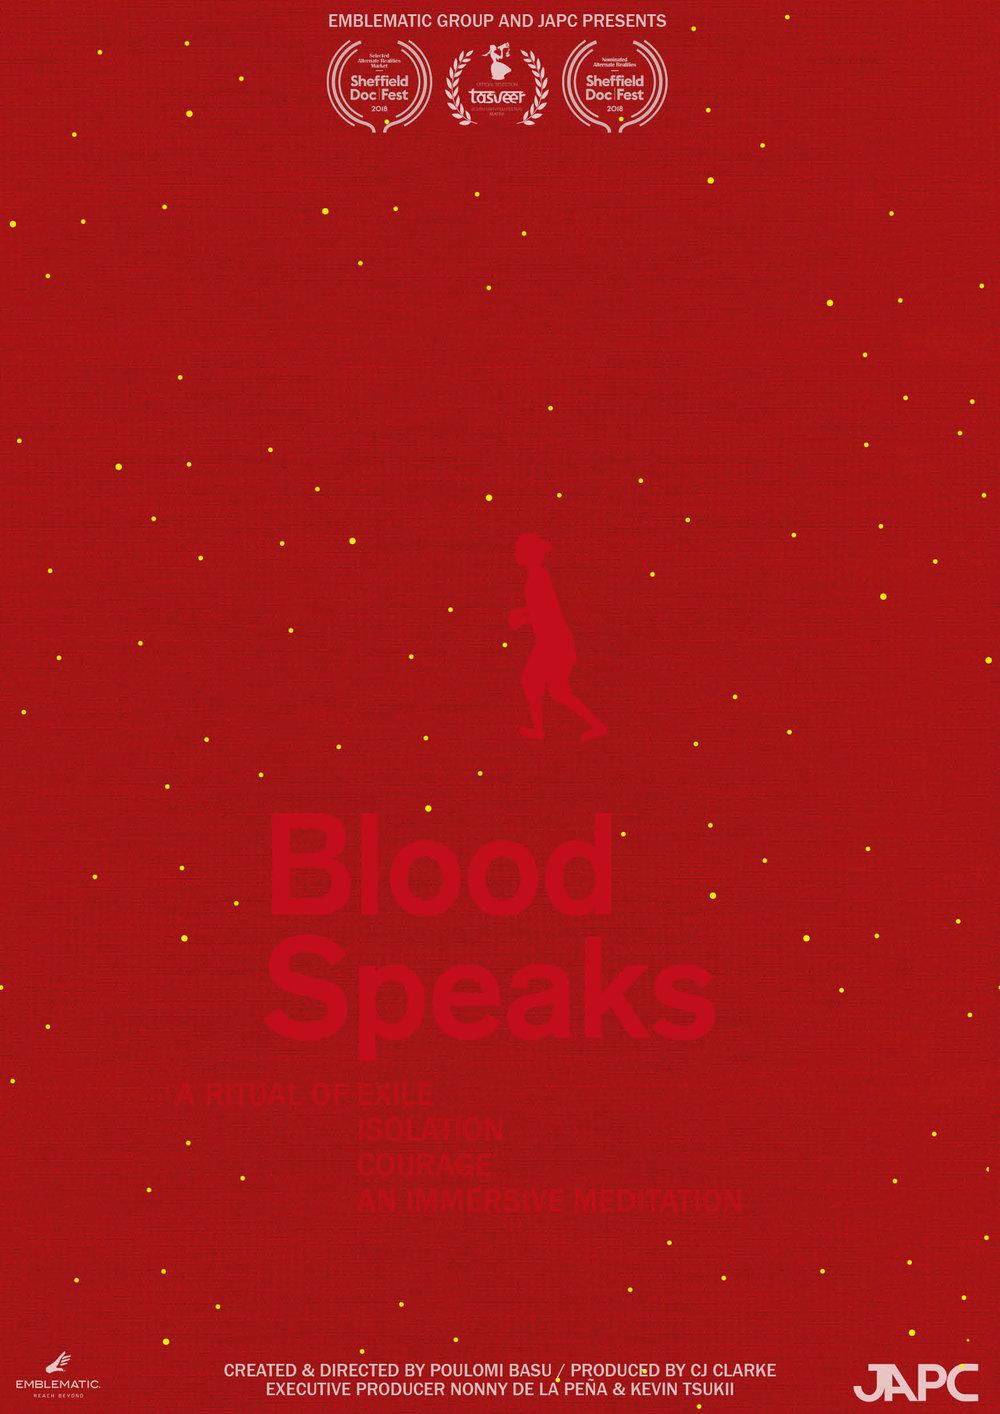 BLOOD_SPEAKS_POSTER_DRAFT_FINAL_03-10-18.jpg